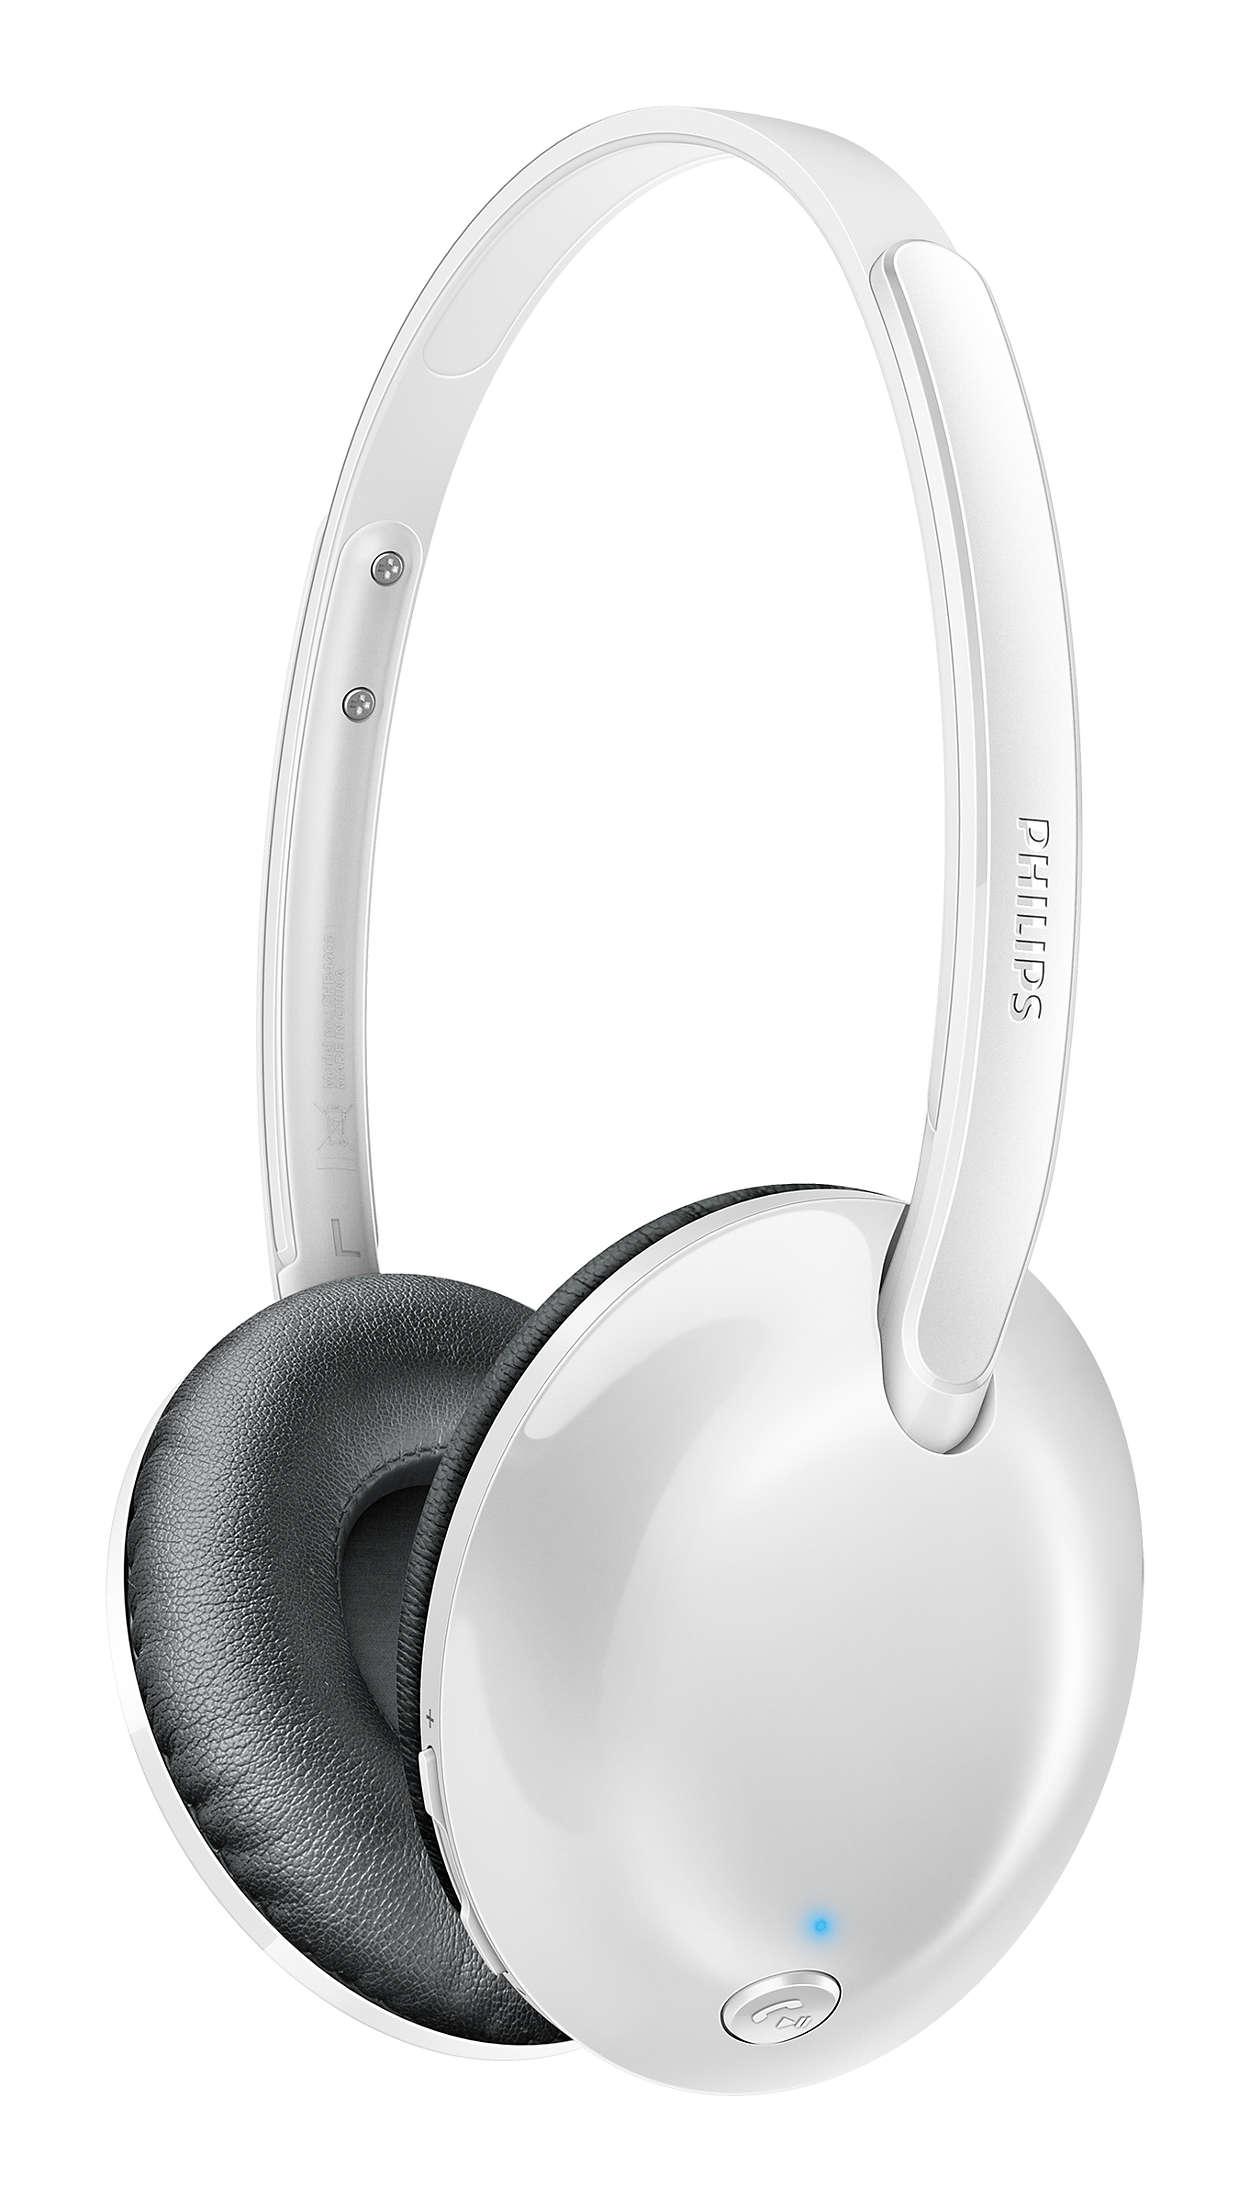 Flite Wireless Bluetooth Headphones Shb4405wt 27 Philips